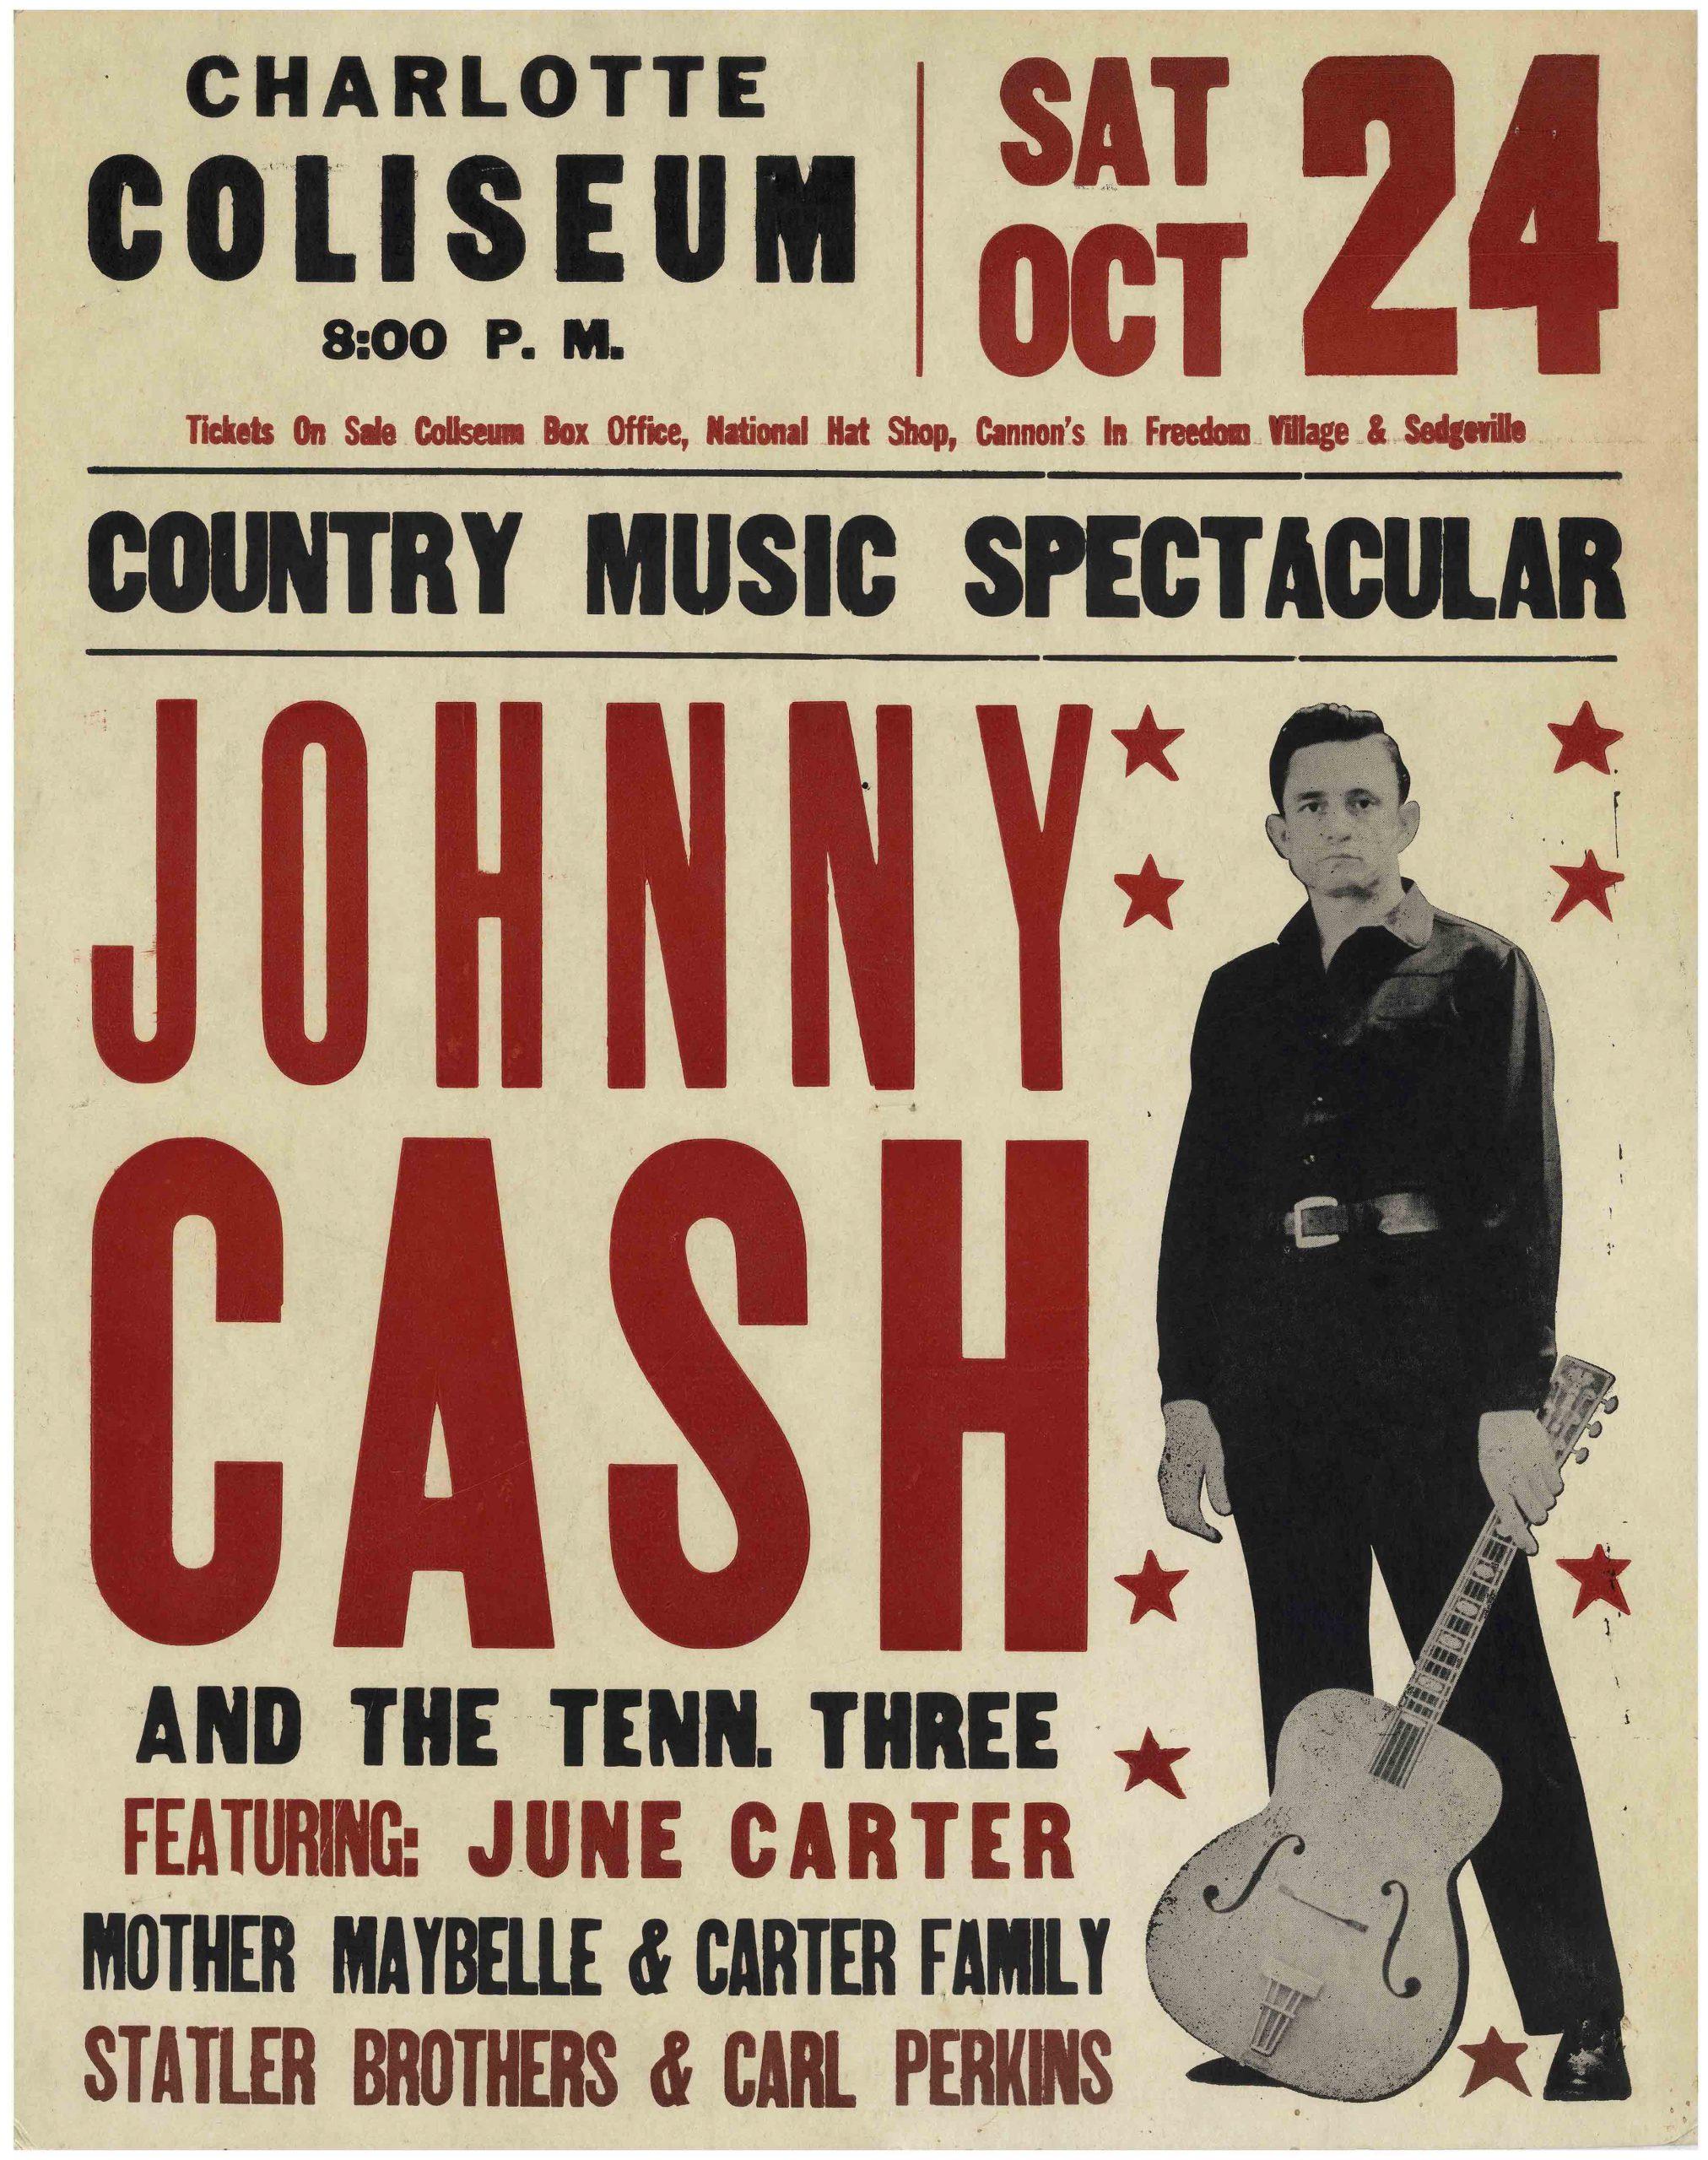 Sell an Original Vintage Johnny Cash Poster at Nate D Sanders Auction